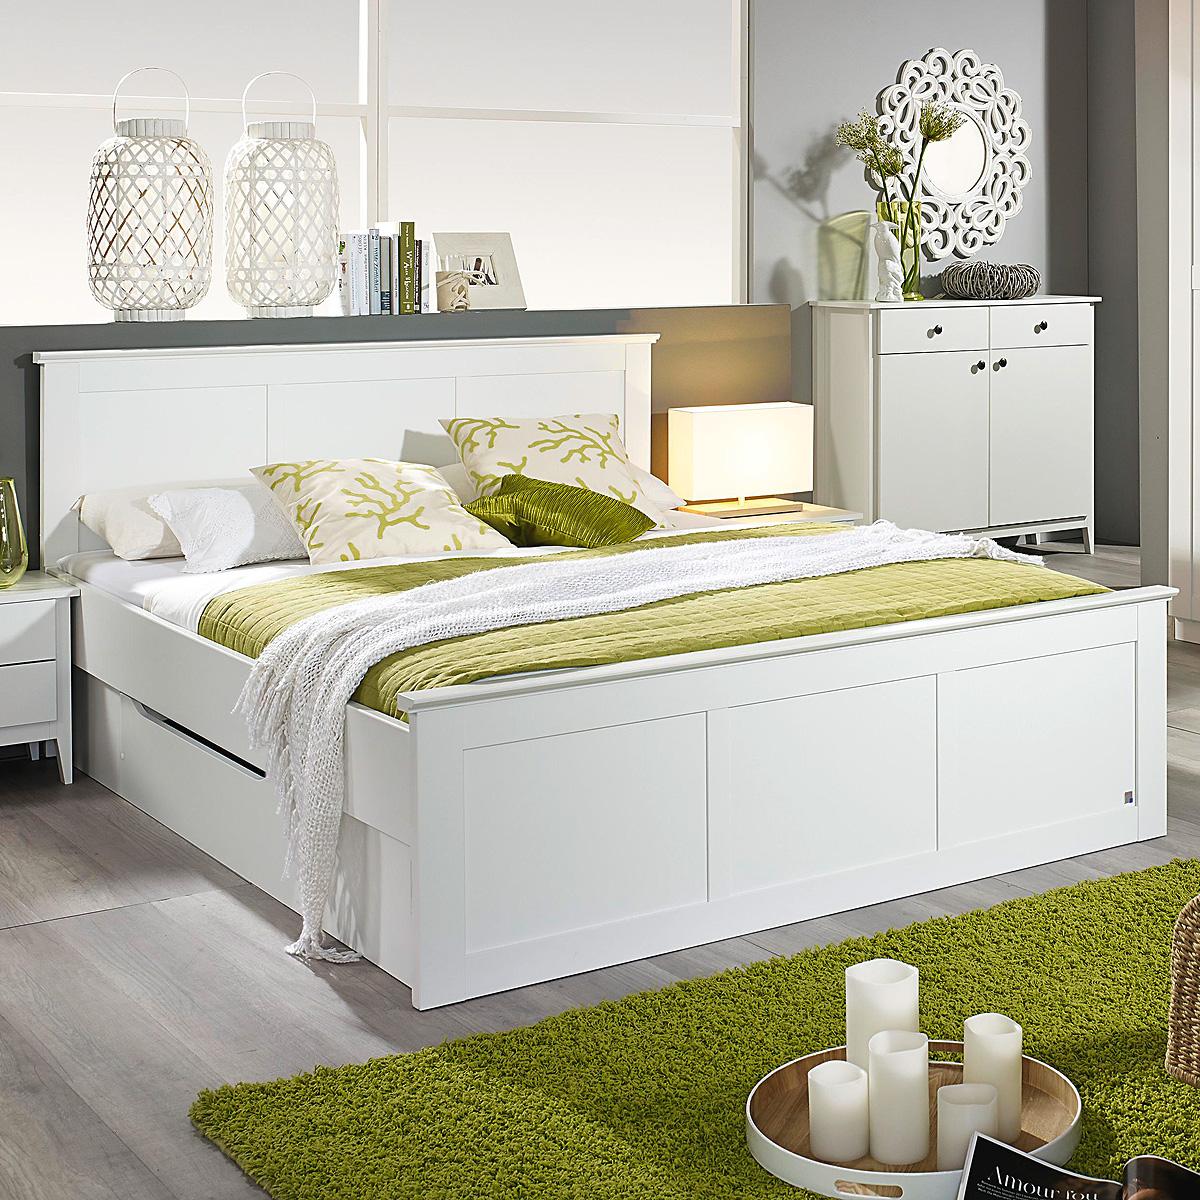 bett rosenheim schlafzimmerbett bettgestell in wei inkl bettschubkasten 180x20 ebay. Black Bedroom Furniture Sets. Home Design Ideas